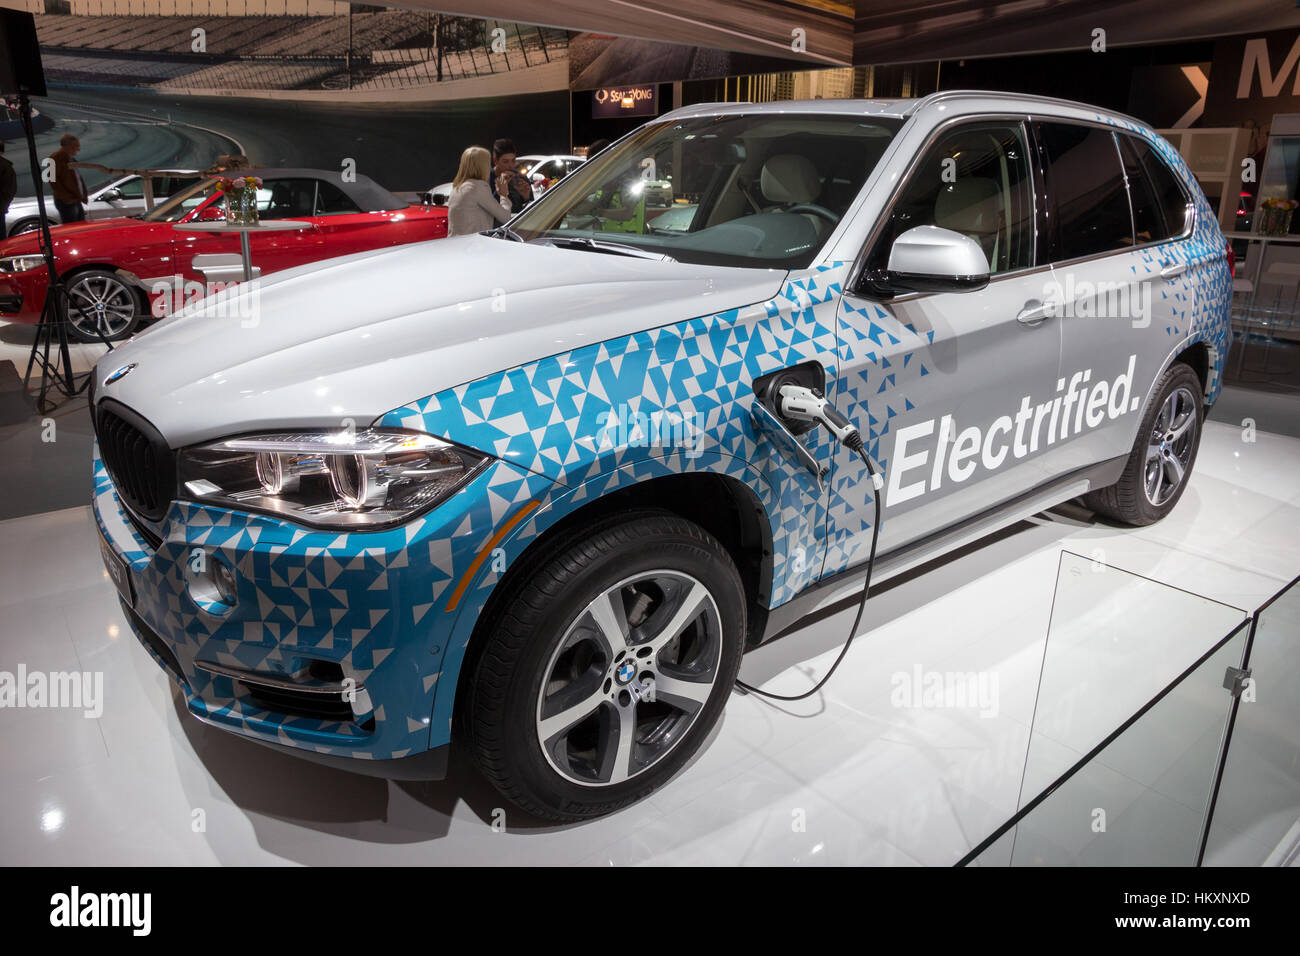 AMSTERDAM - APRIL 16, 2015: BMW X5 PHEV on display at the Amsterdam AutoRAI Motor Show. - Stock Image